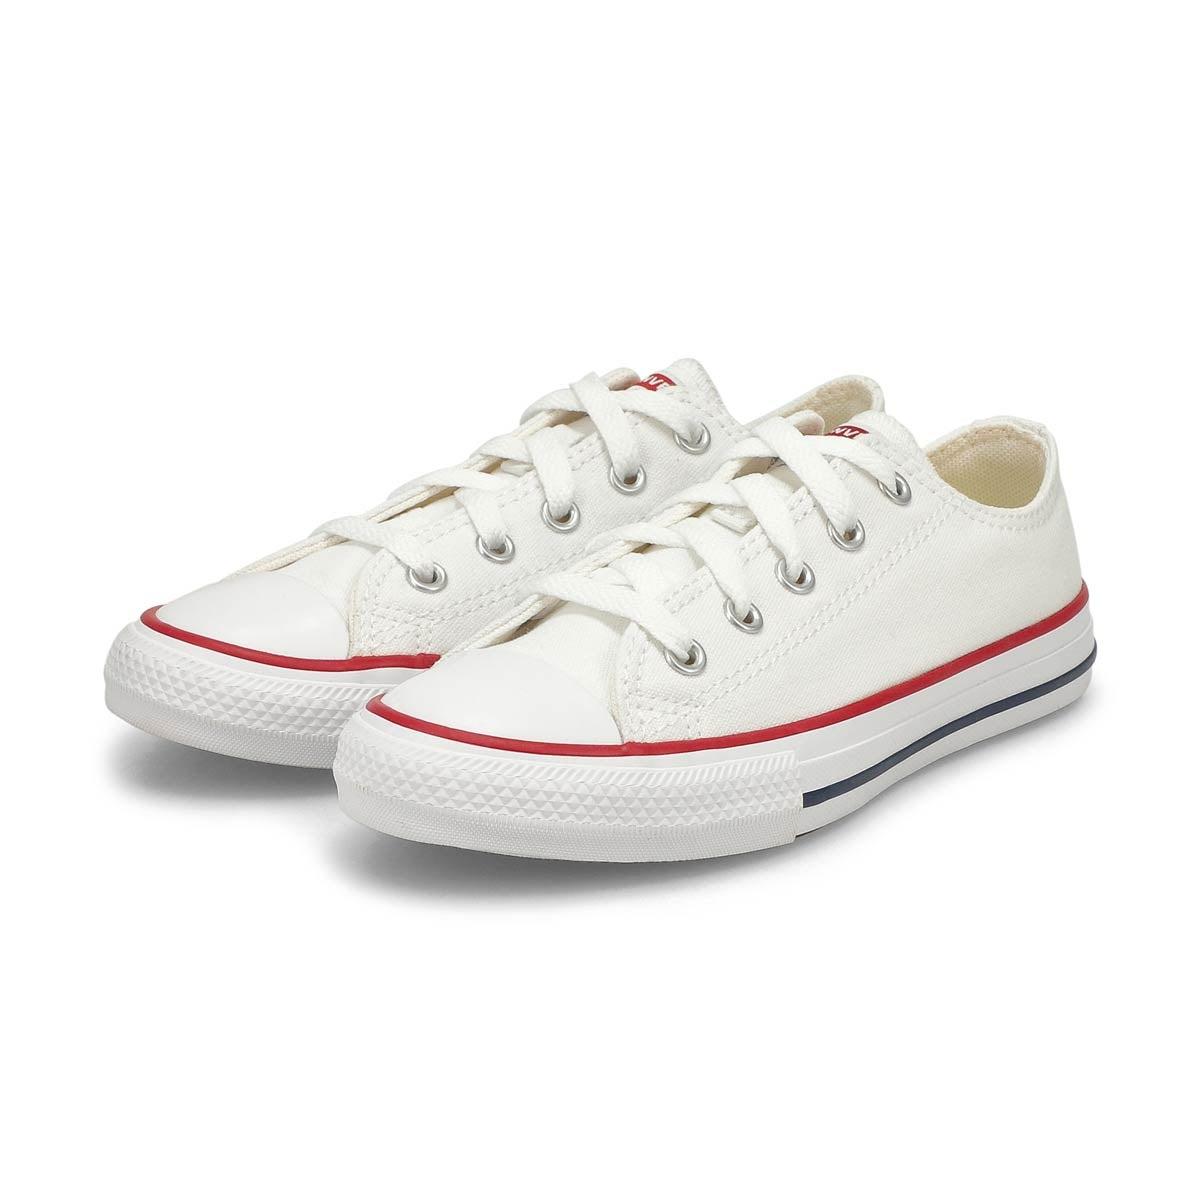 Kids' Chuck Taylor All Star Sneaker - White